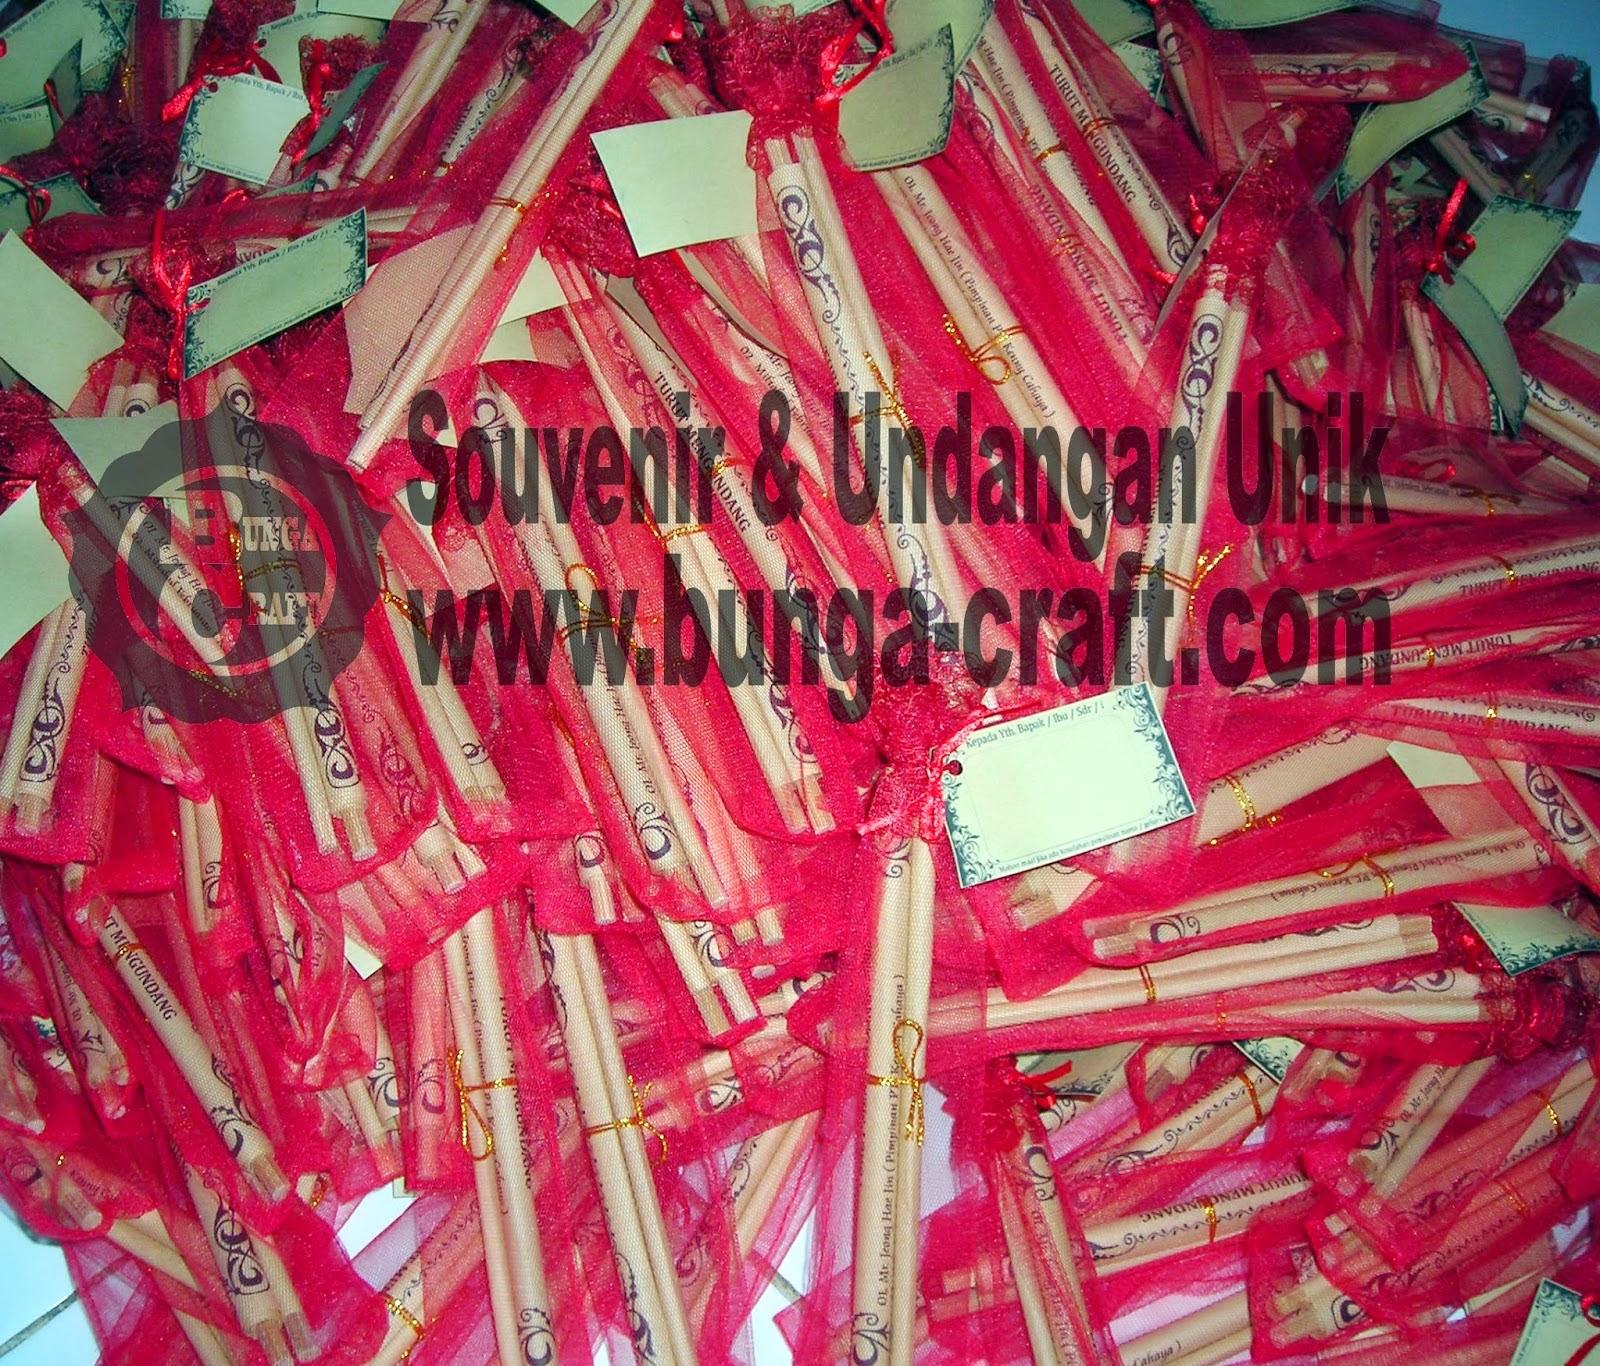 http://www.bunga-craft.com/2013/06/undangan-gulung-hemat.html